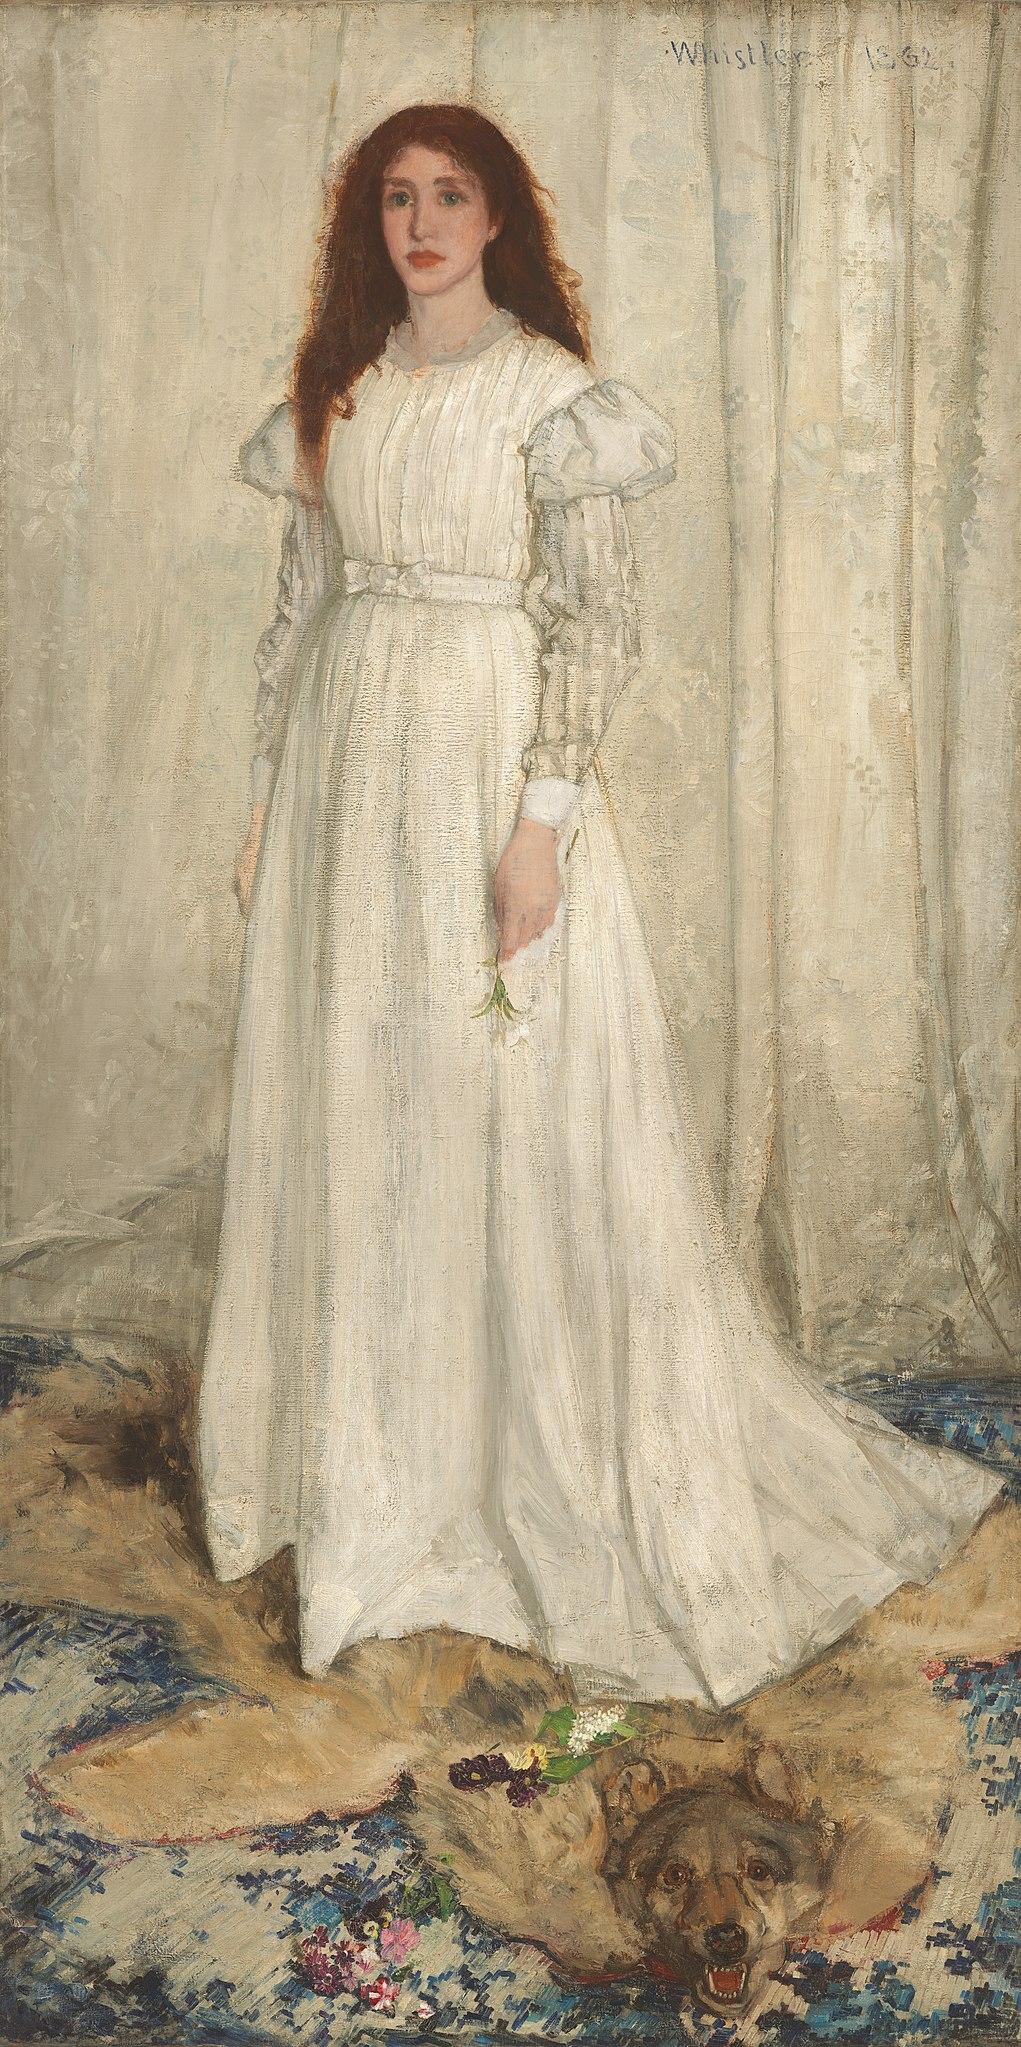 Whistler_James_Symphony_in_White_no_1_(The_White_Girl)_1862